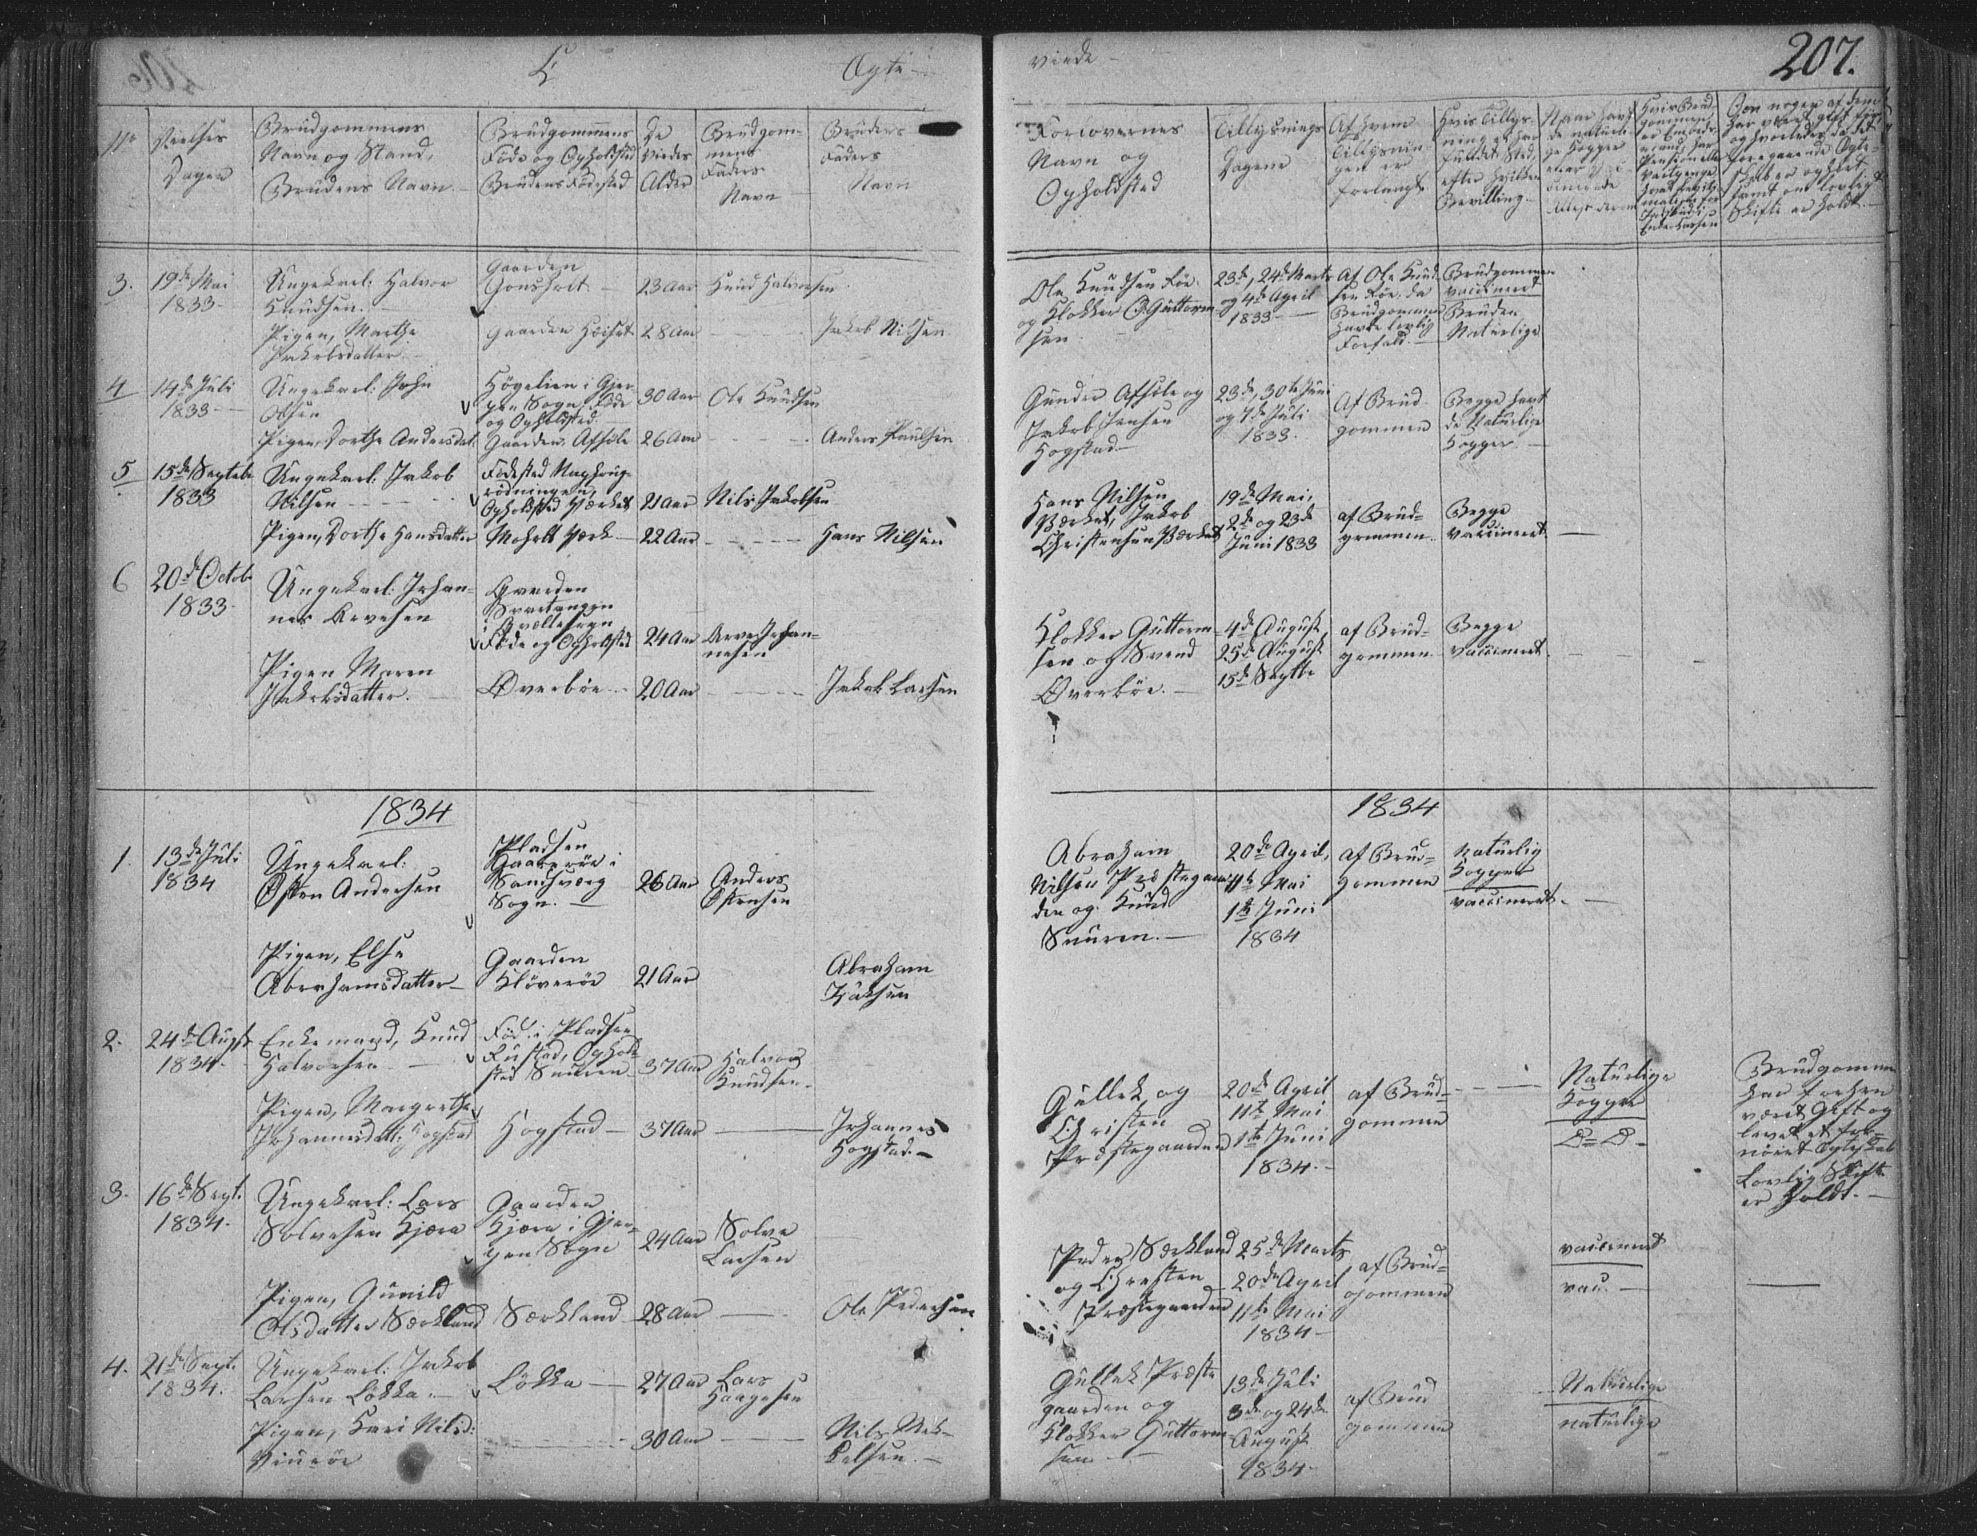 SAKO, Siljan kirkebøker, F/Fa/L0001: Parish register (official) no. 1, 1831-1870, p. 207